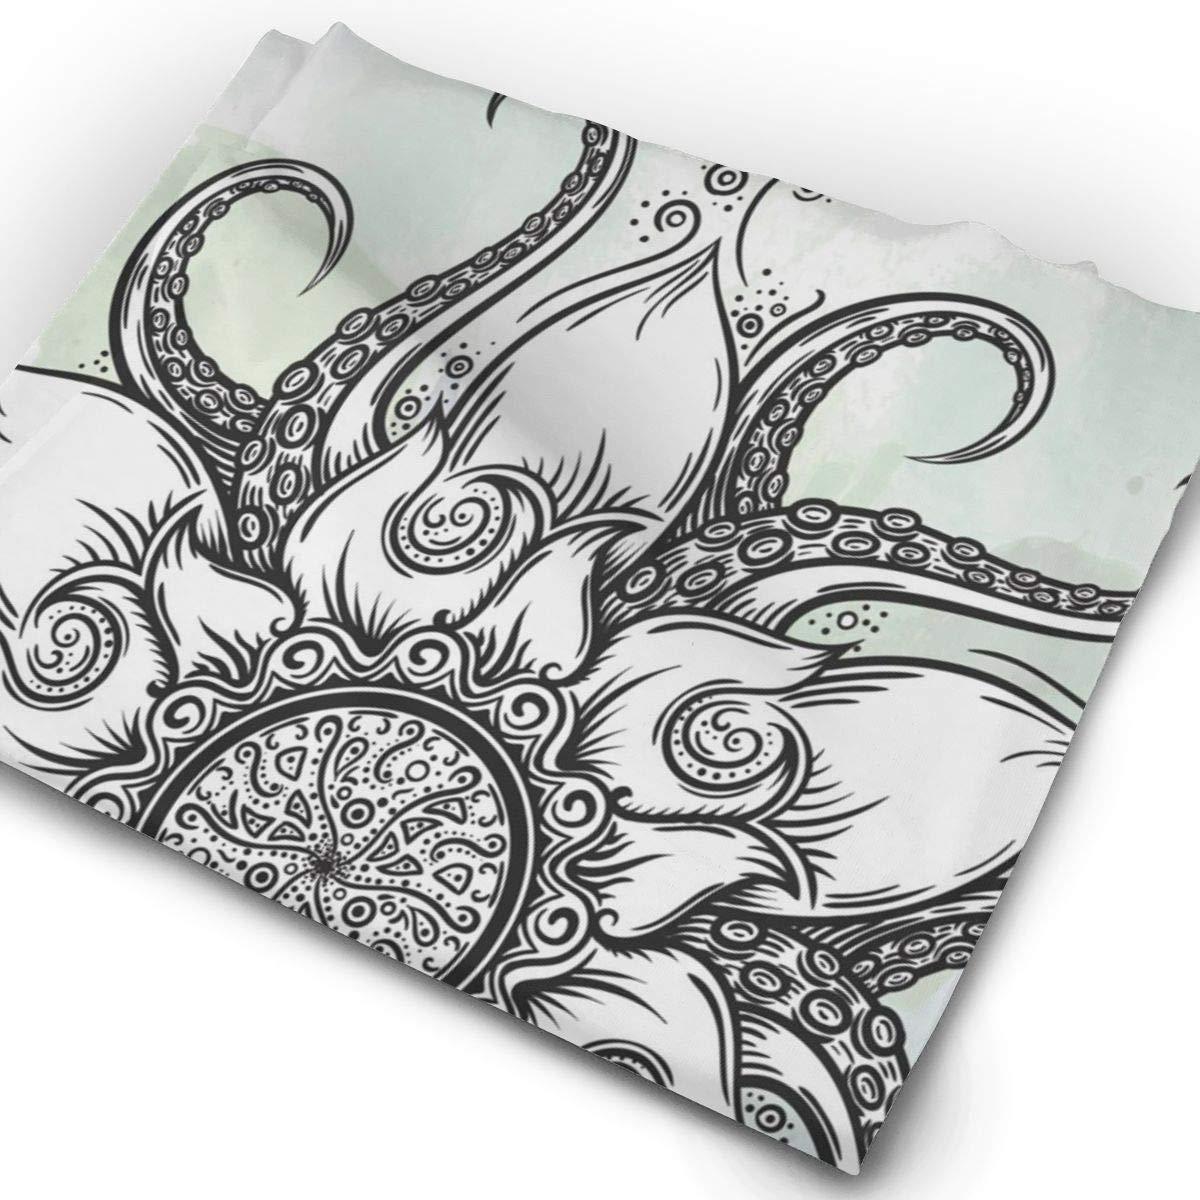 Headbands Octopus Headwear Bandana Sweatband Gaiter Head Wrap Mask Neck Outdoor Scarf